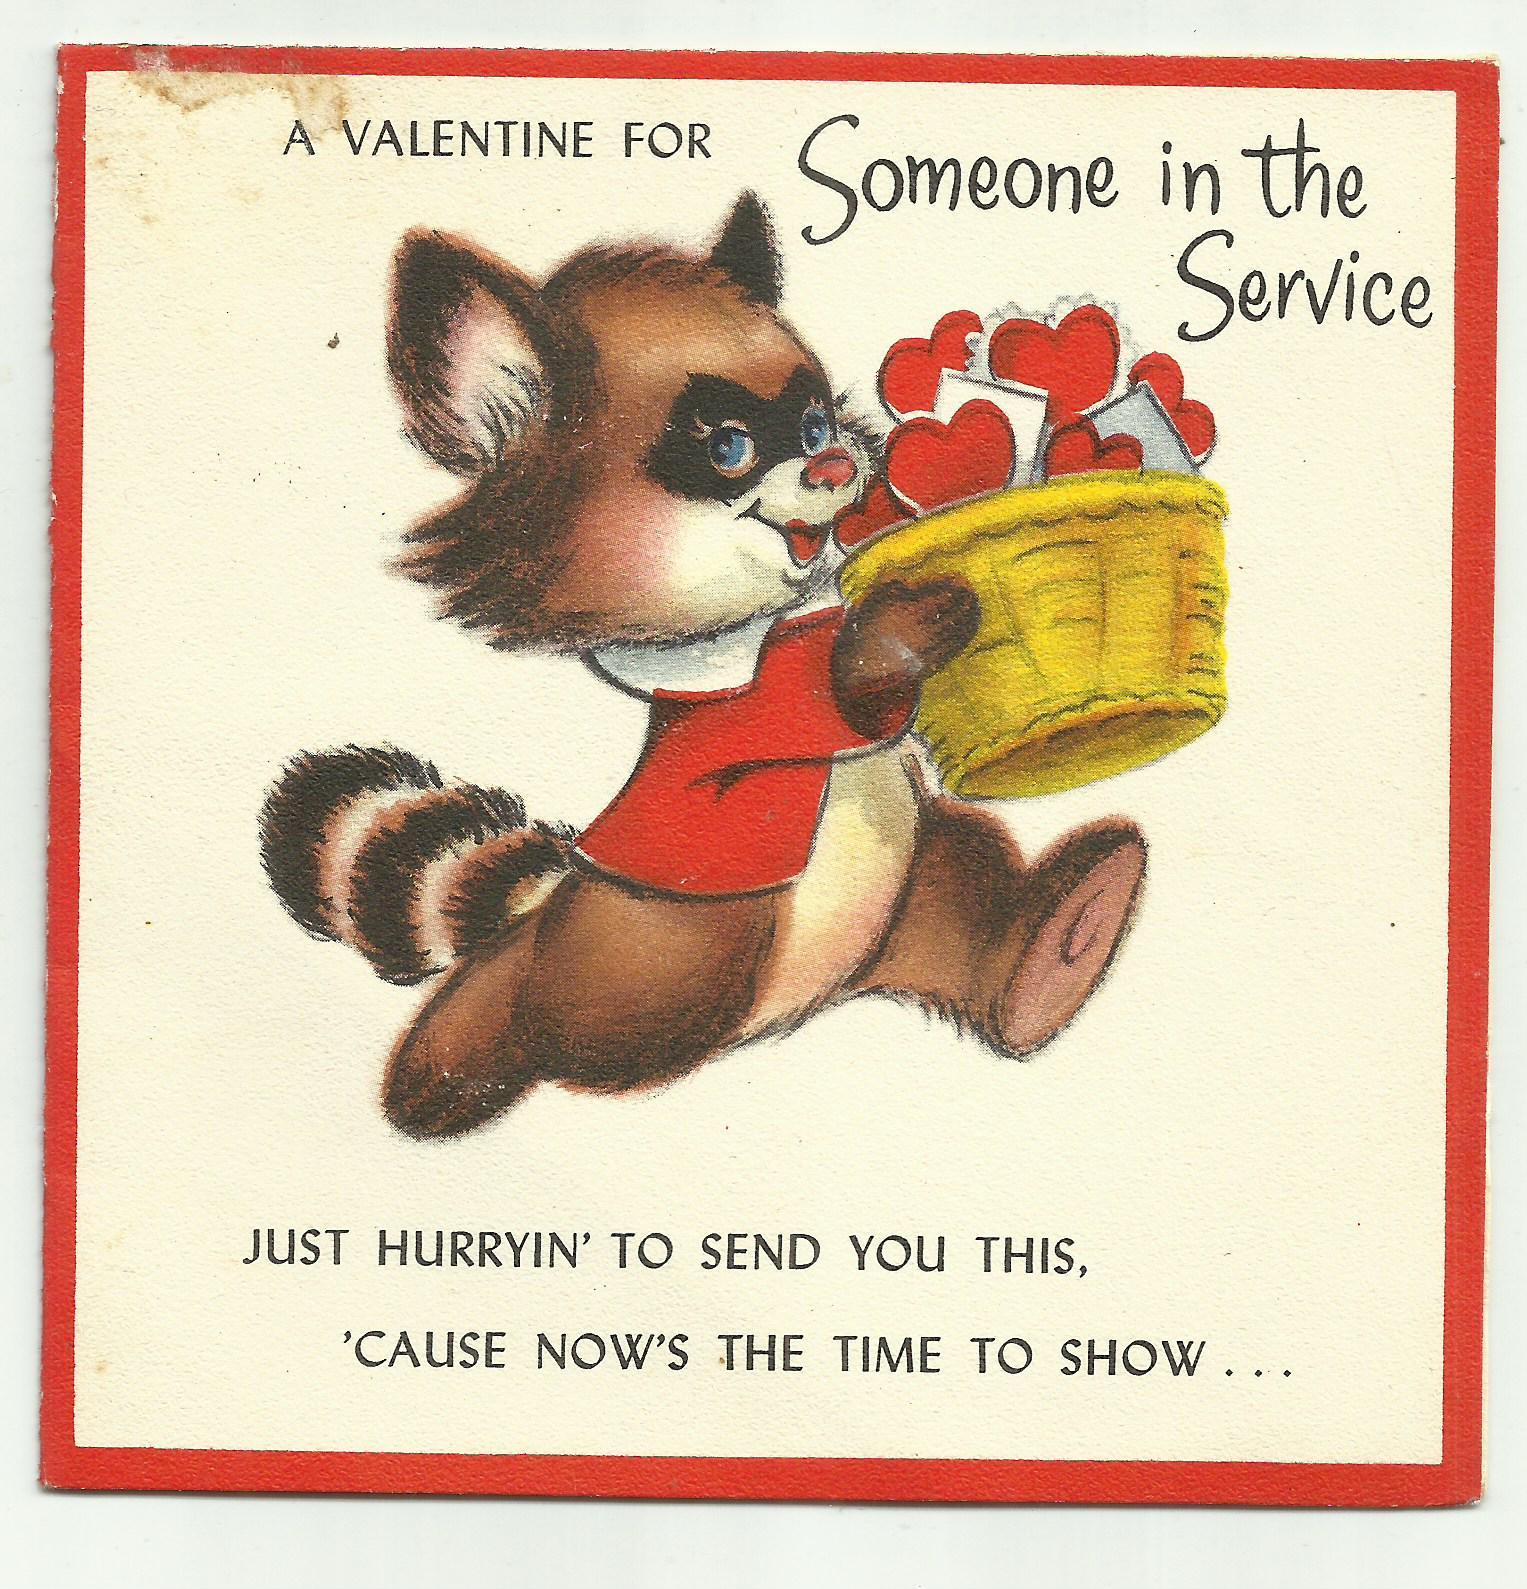 Vintage Valentine\u2019s Day Super Rainbow Heart lapel pin Cute Vintage Valentine\u2019s Day Hallmark lapel pin